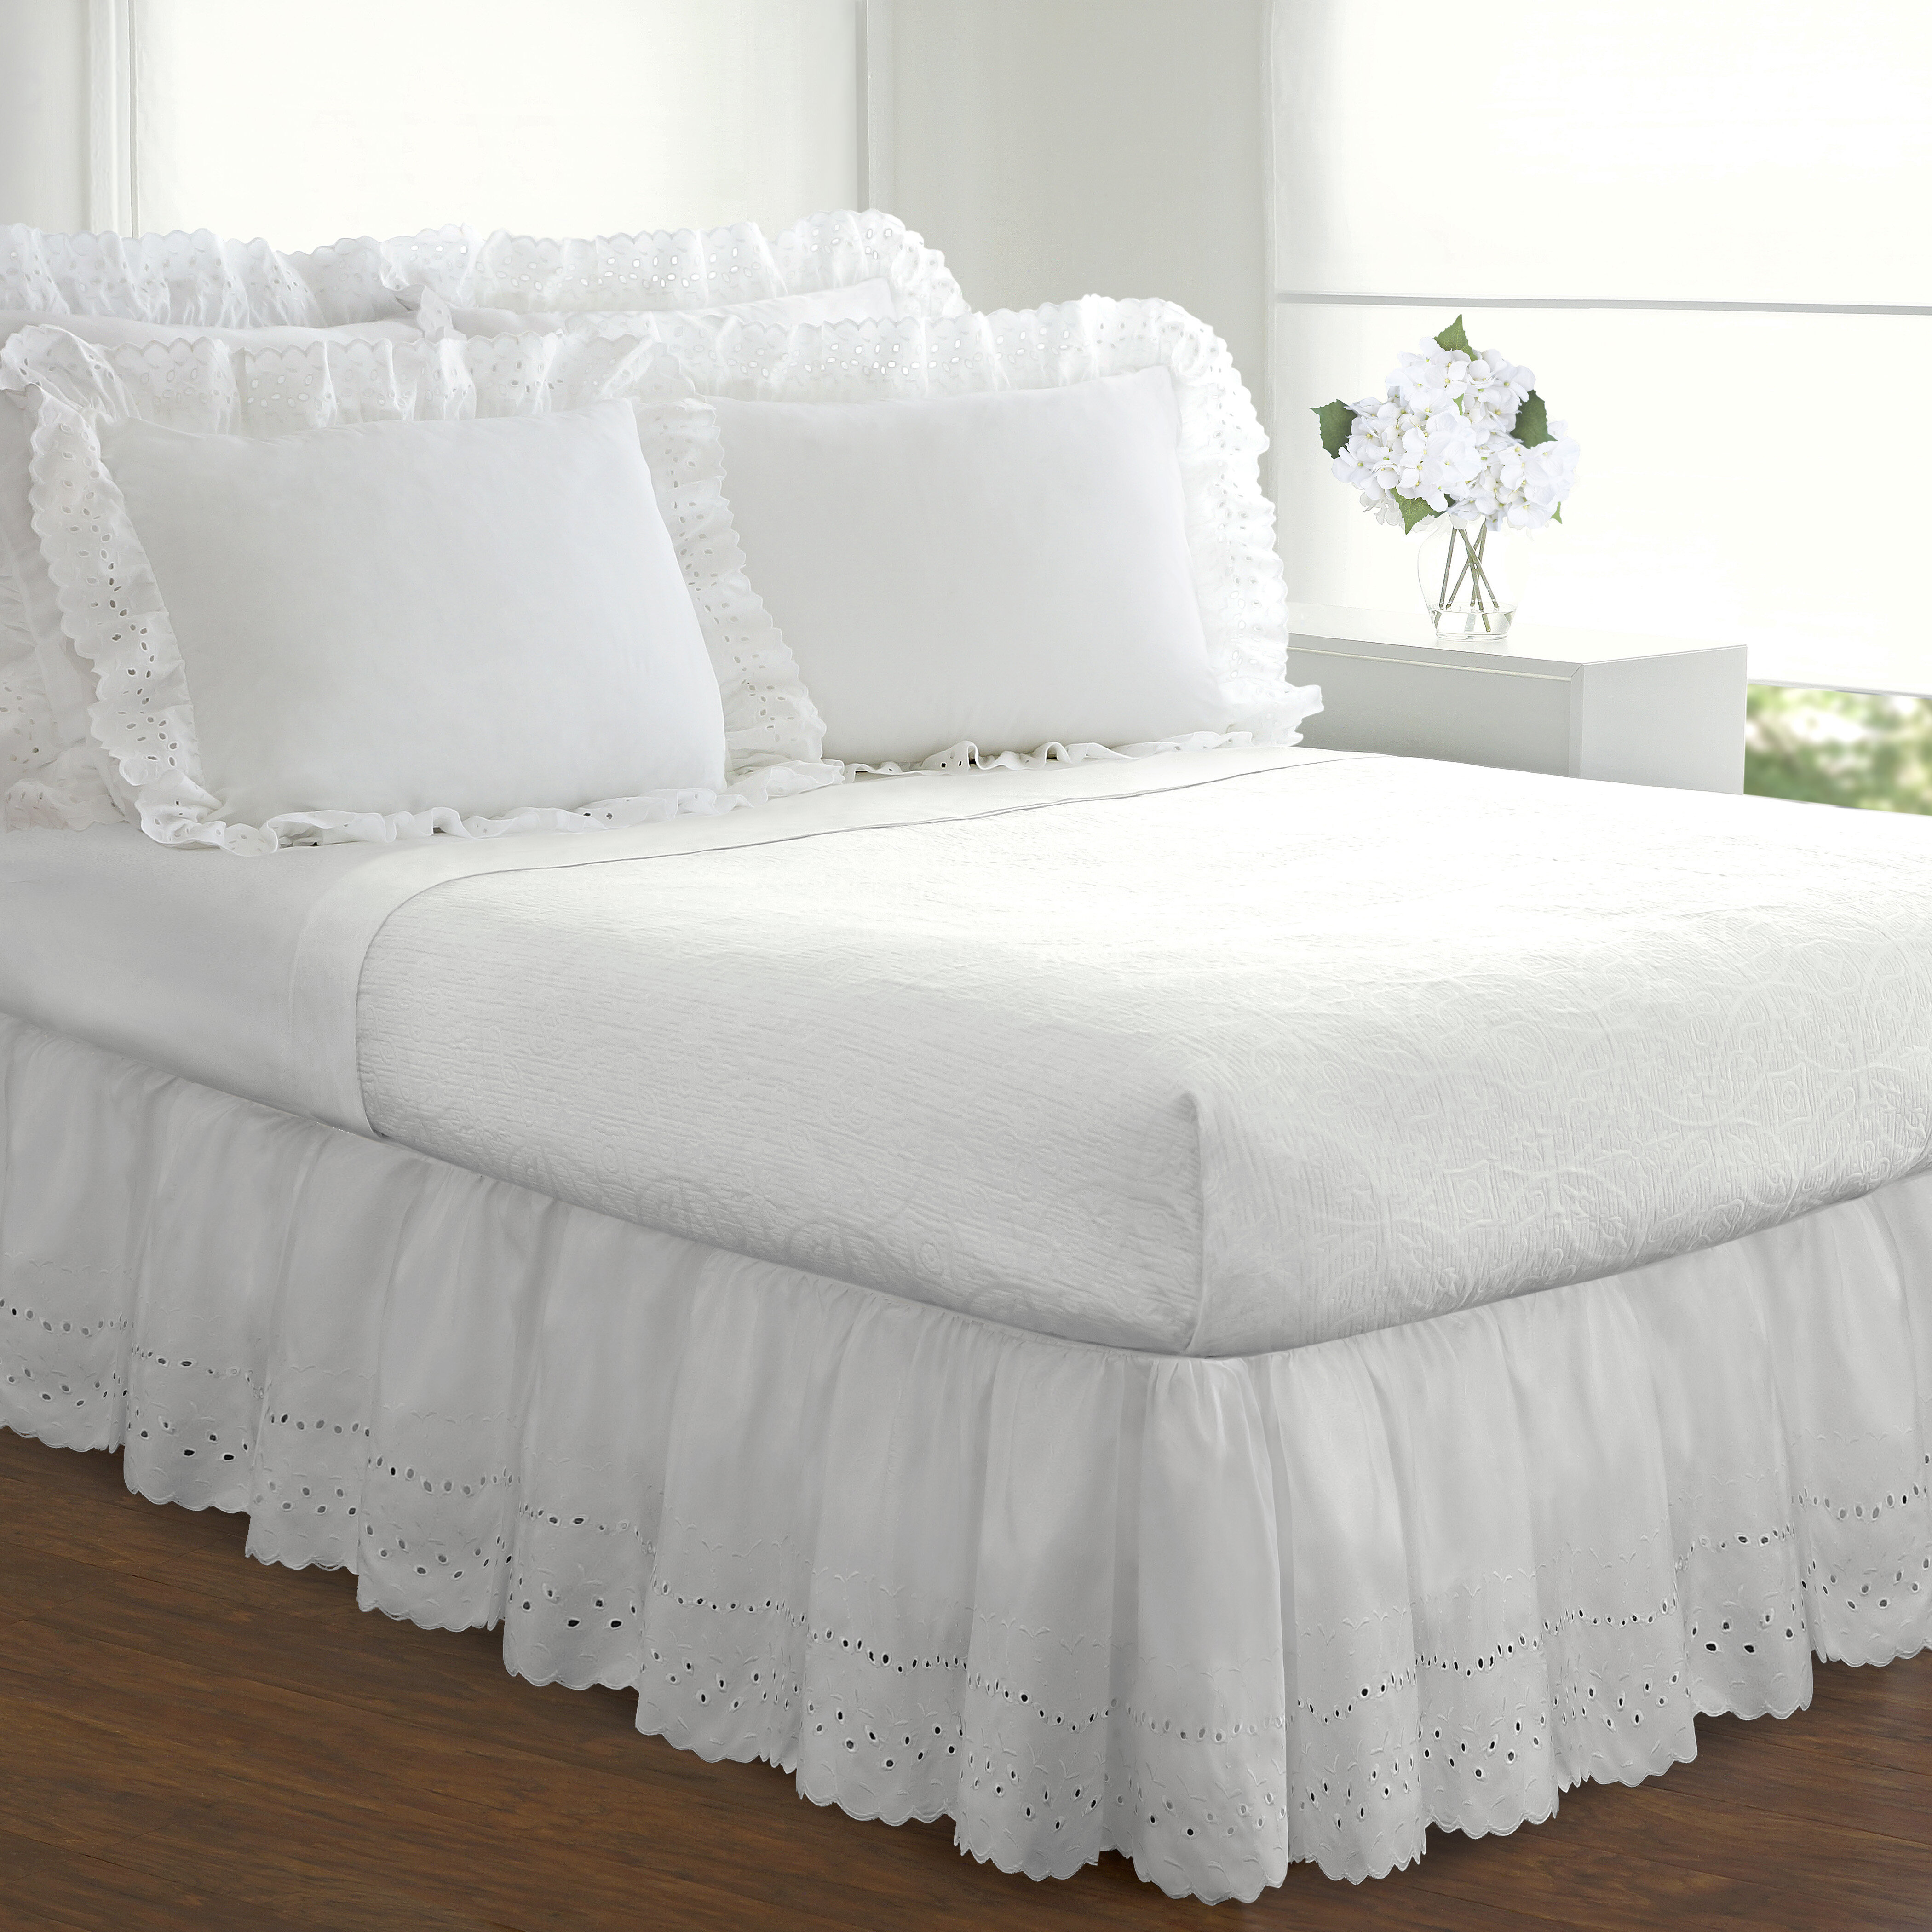 Dakota Eyelet Extra Long 145 Thread Count 18 Bed Skirt Reviews